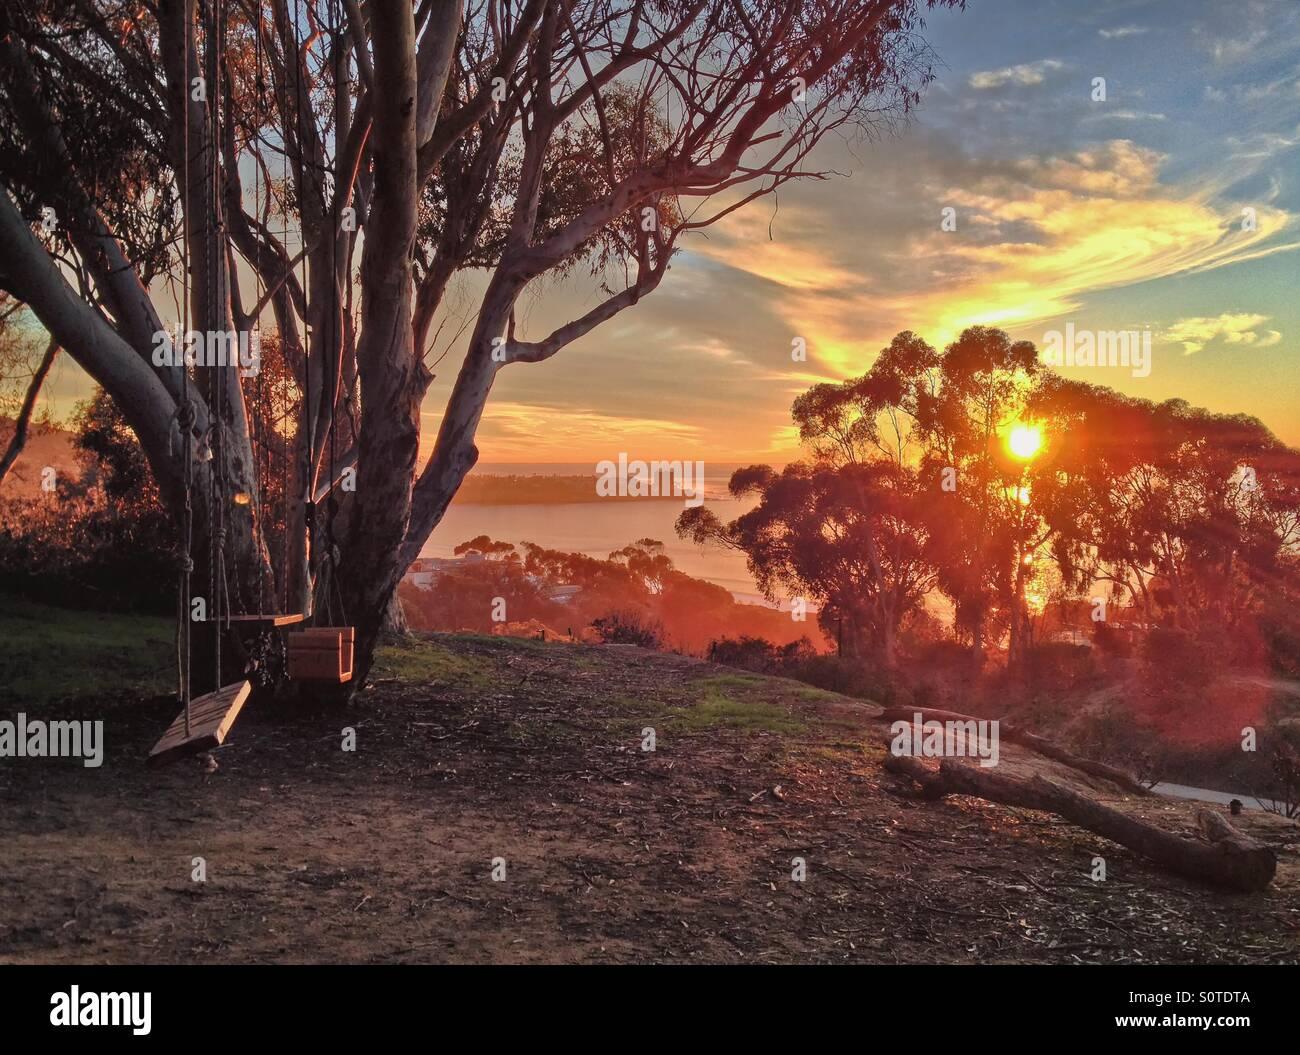 Set of swings on a tree overlooking the ocean at sunset, La Jolla, California, USA - Stock Image